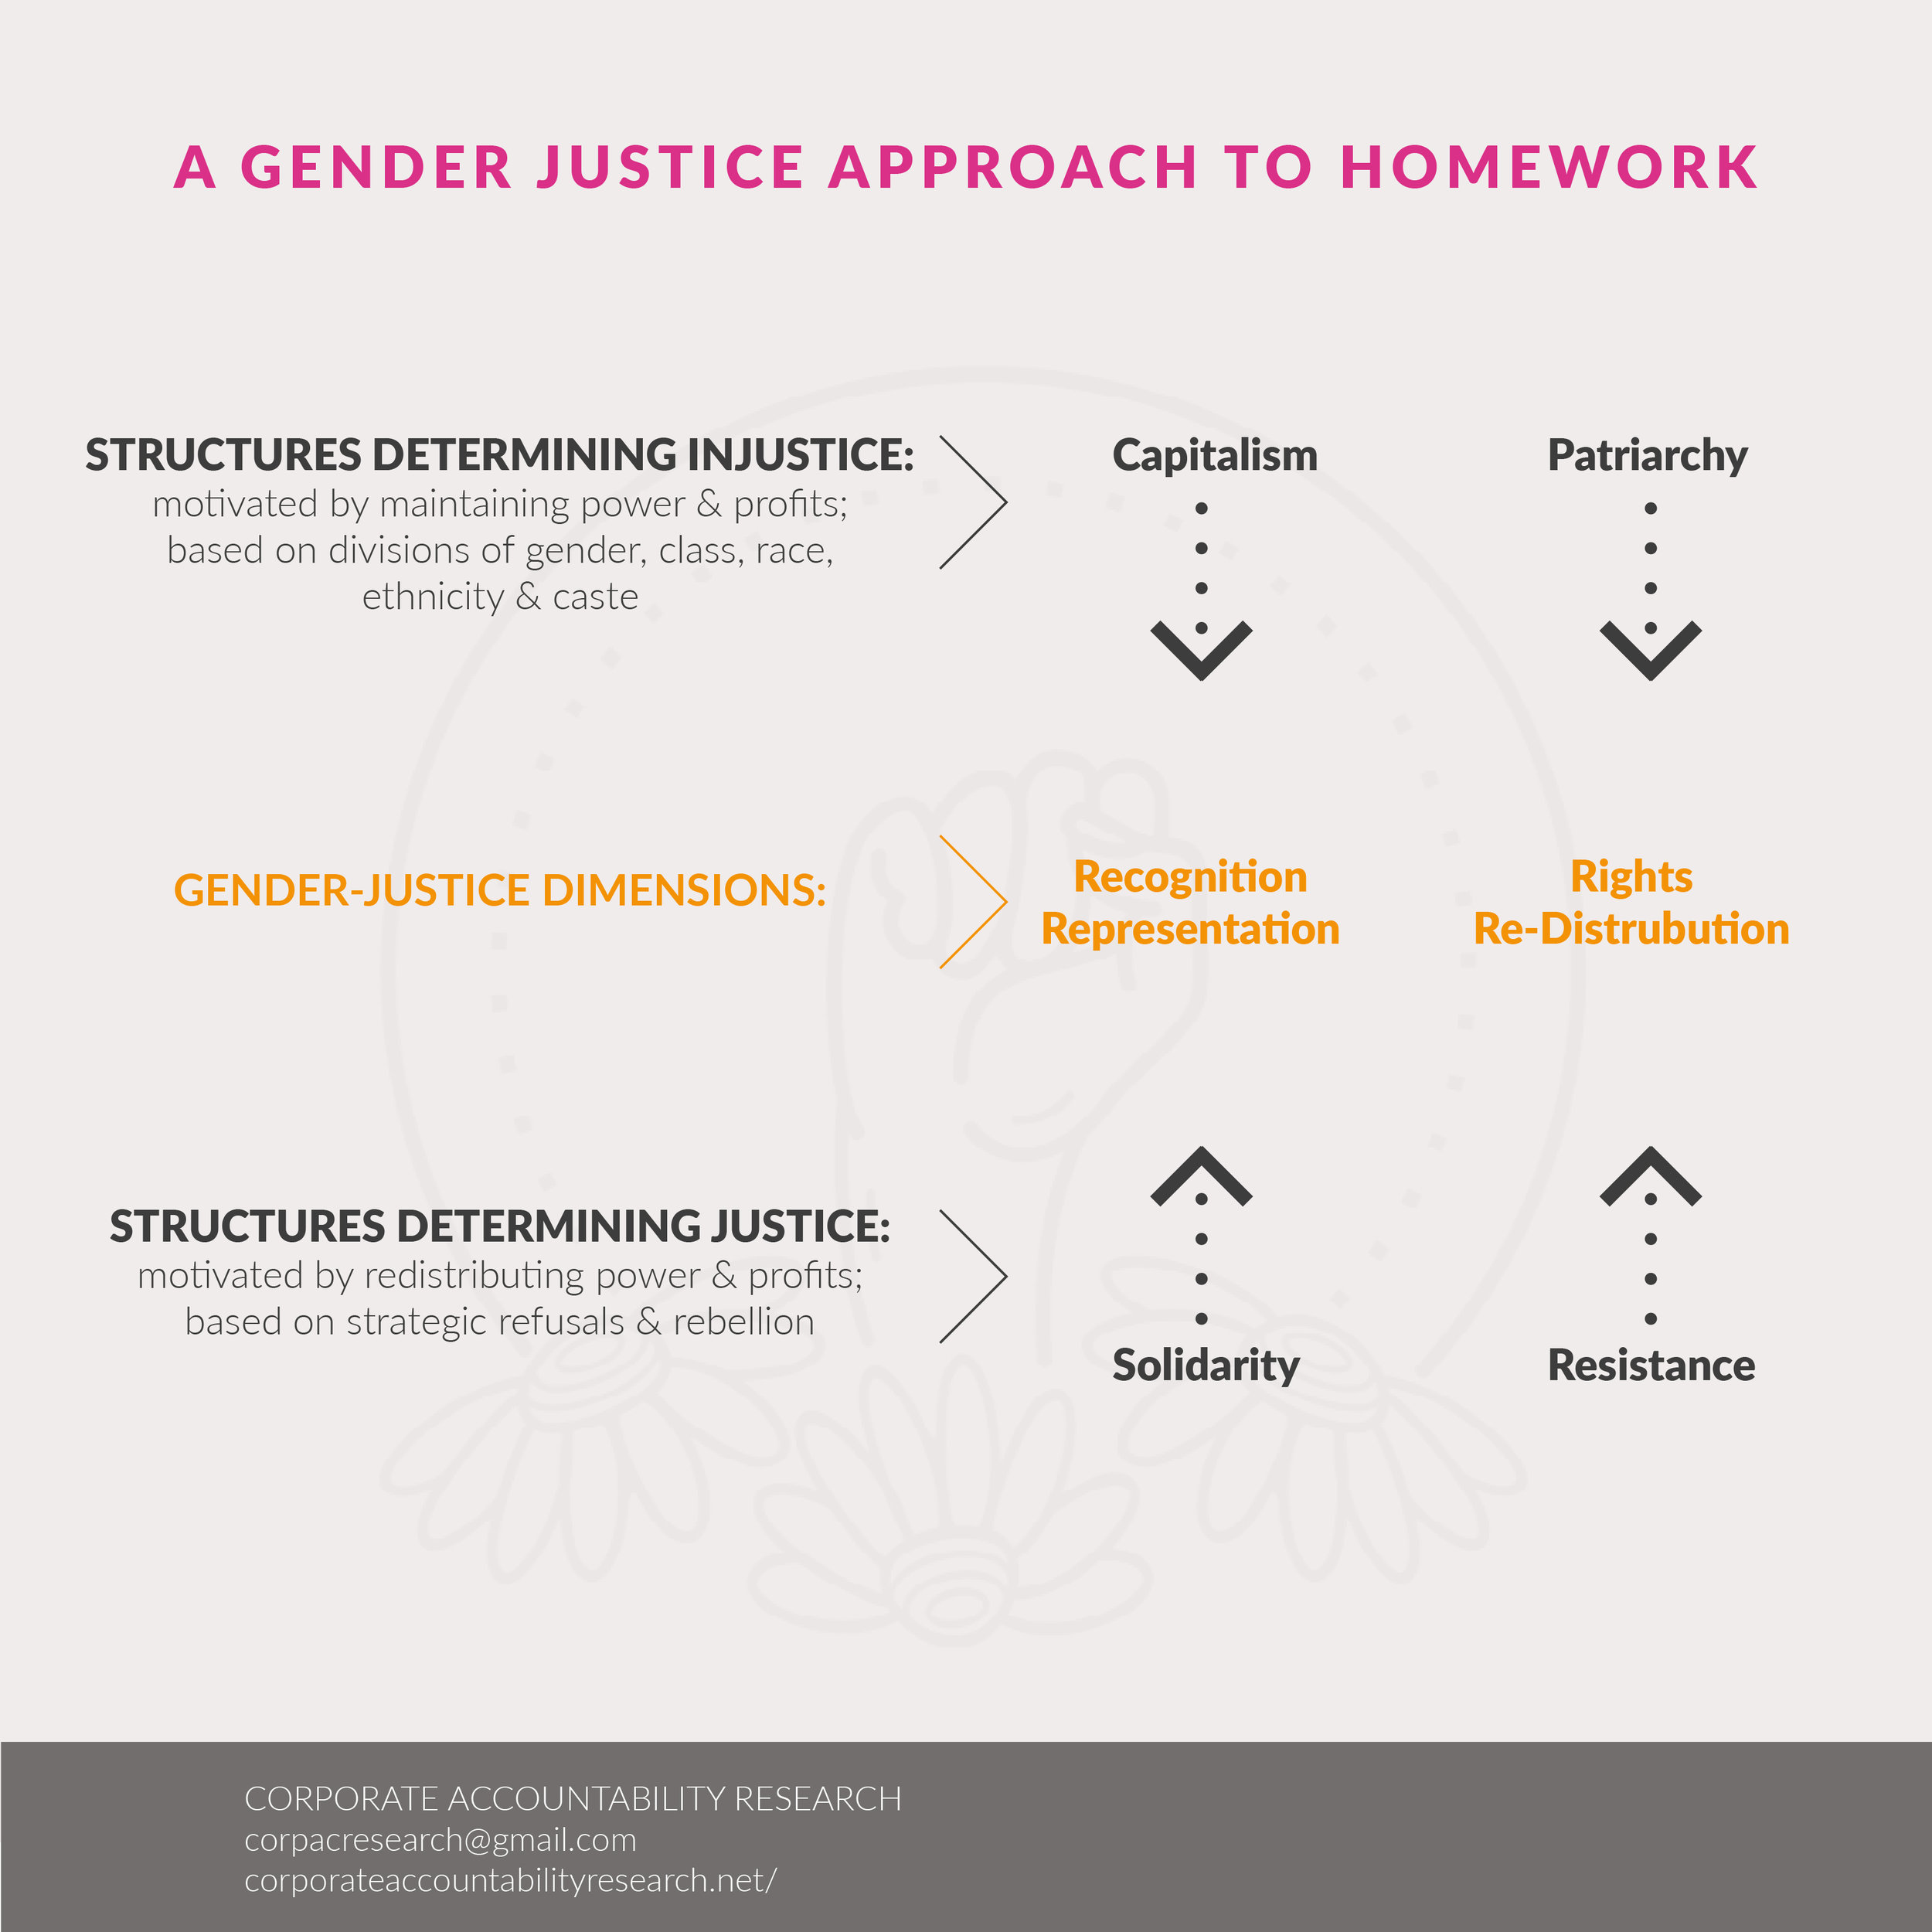 genderjusticeapproach.jpg